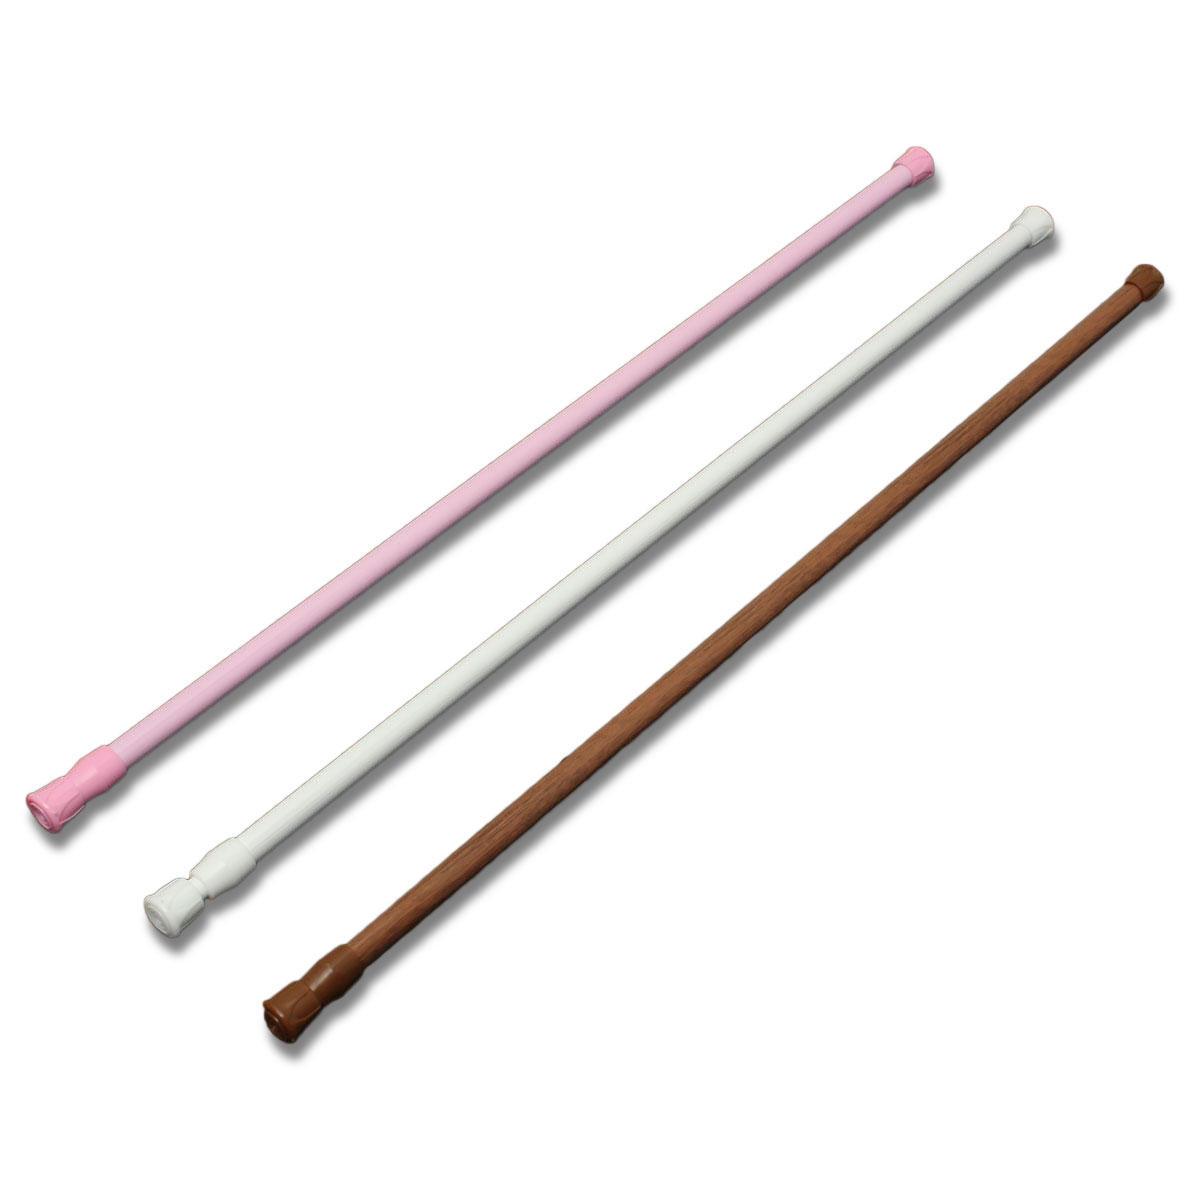 60 110cm Extendable Adjustable Spring Tension Curtain Rod Pole Telescopic Pole Shower Curtain Rod